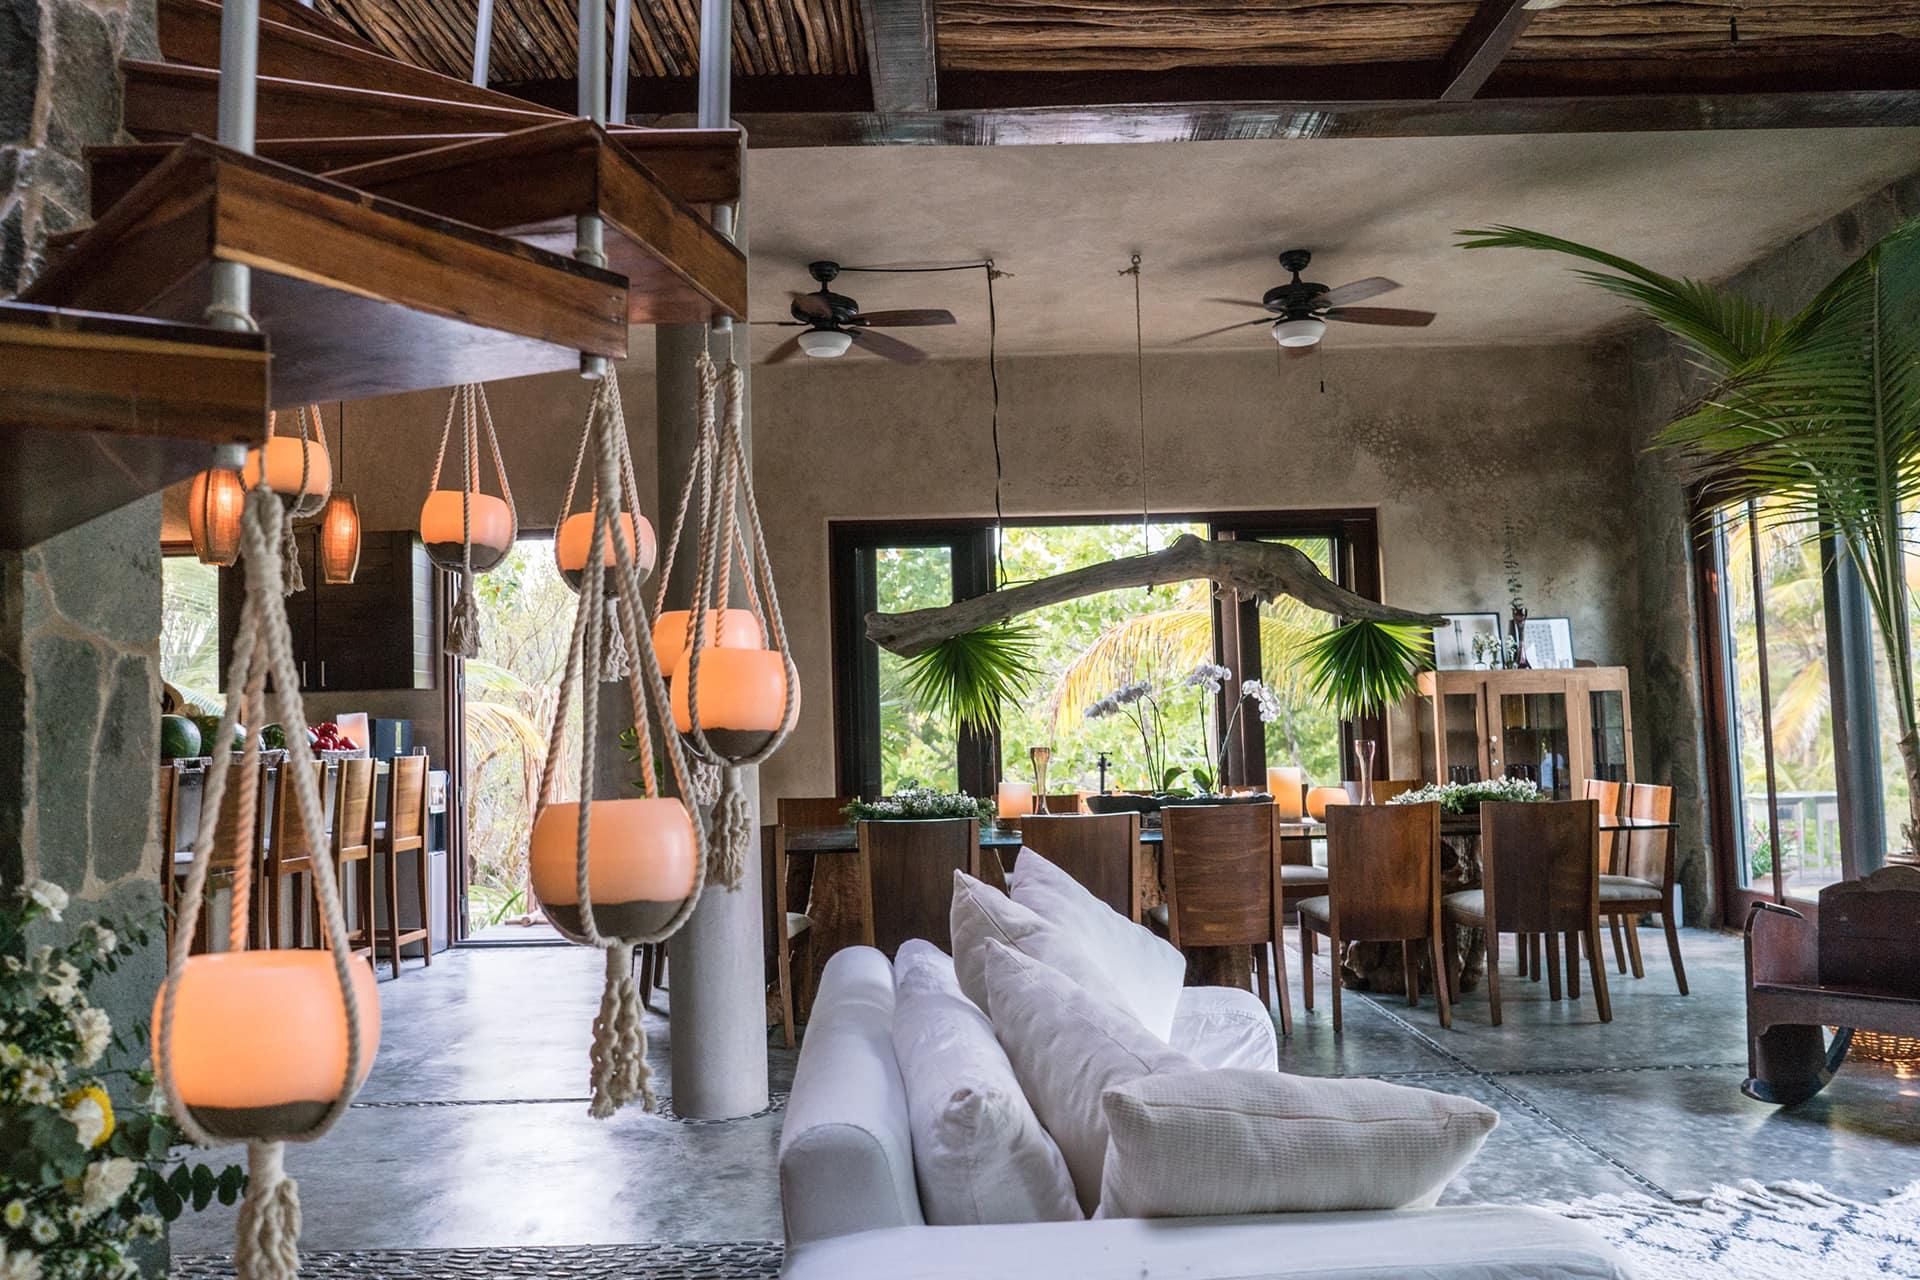 Casa-Maya-Kaan-Tulum-FREE-FLOW-ENVIROMENT-2.jpg